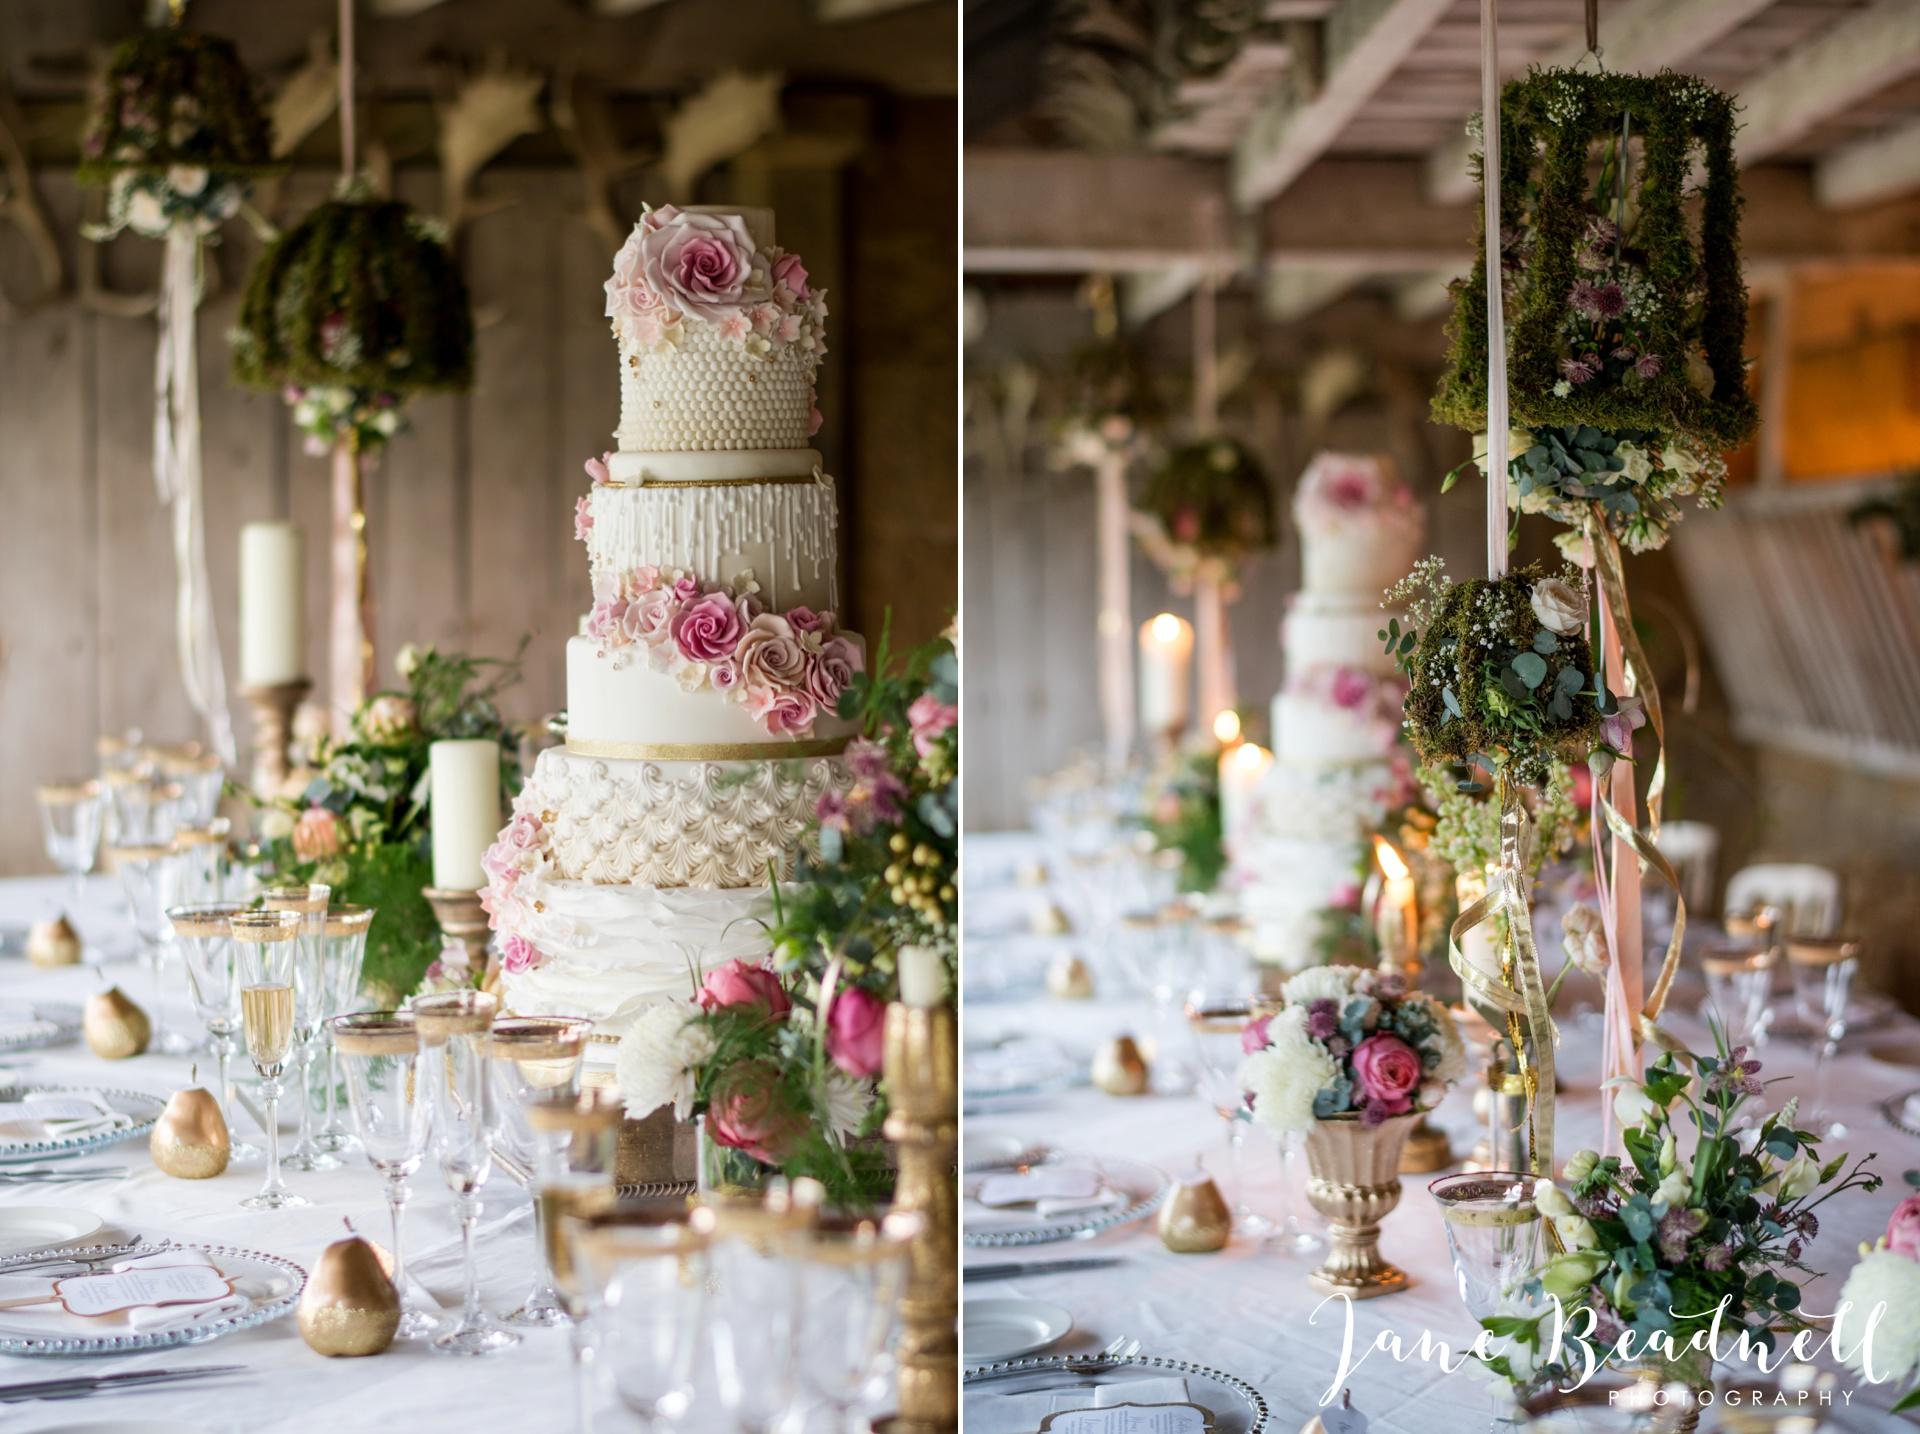 Jane Beadnell fine art wedding photographer Swinton Park2